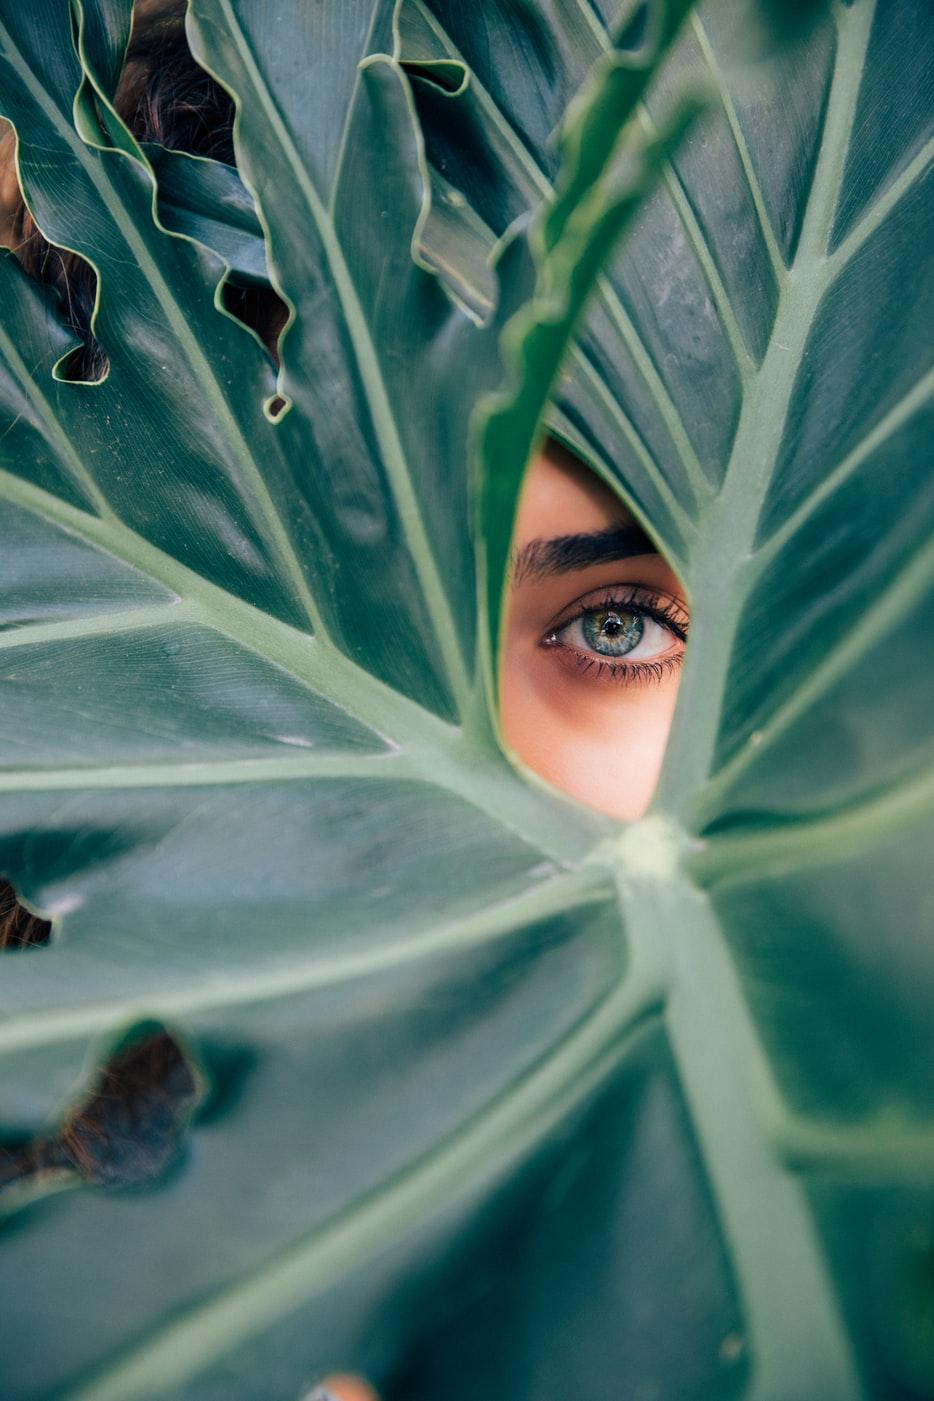 vanm-van-m-ecofriendly-ecology-sewing-made-in-belgium-picture-couture-nature-sustainable-fabrics-credits-unsplash-drew-graham-1